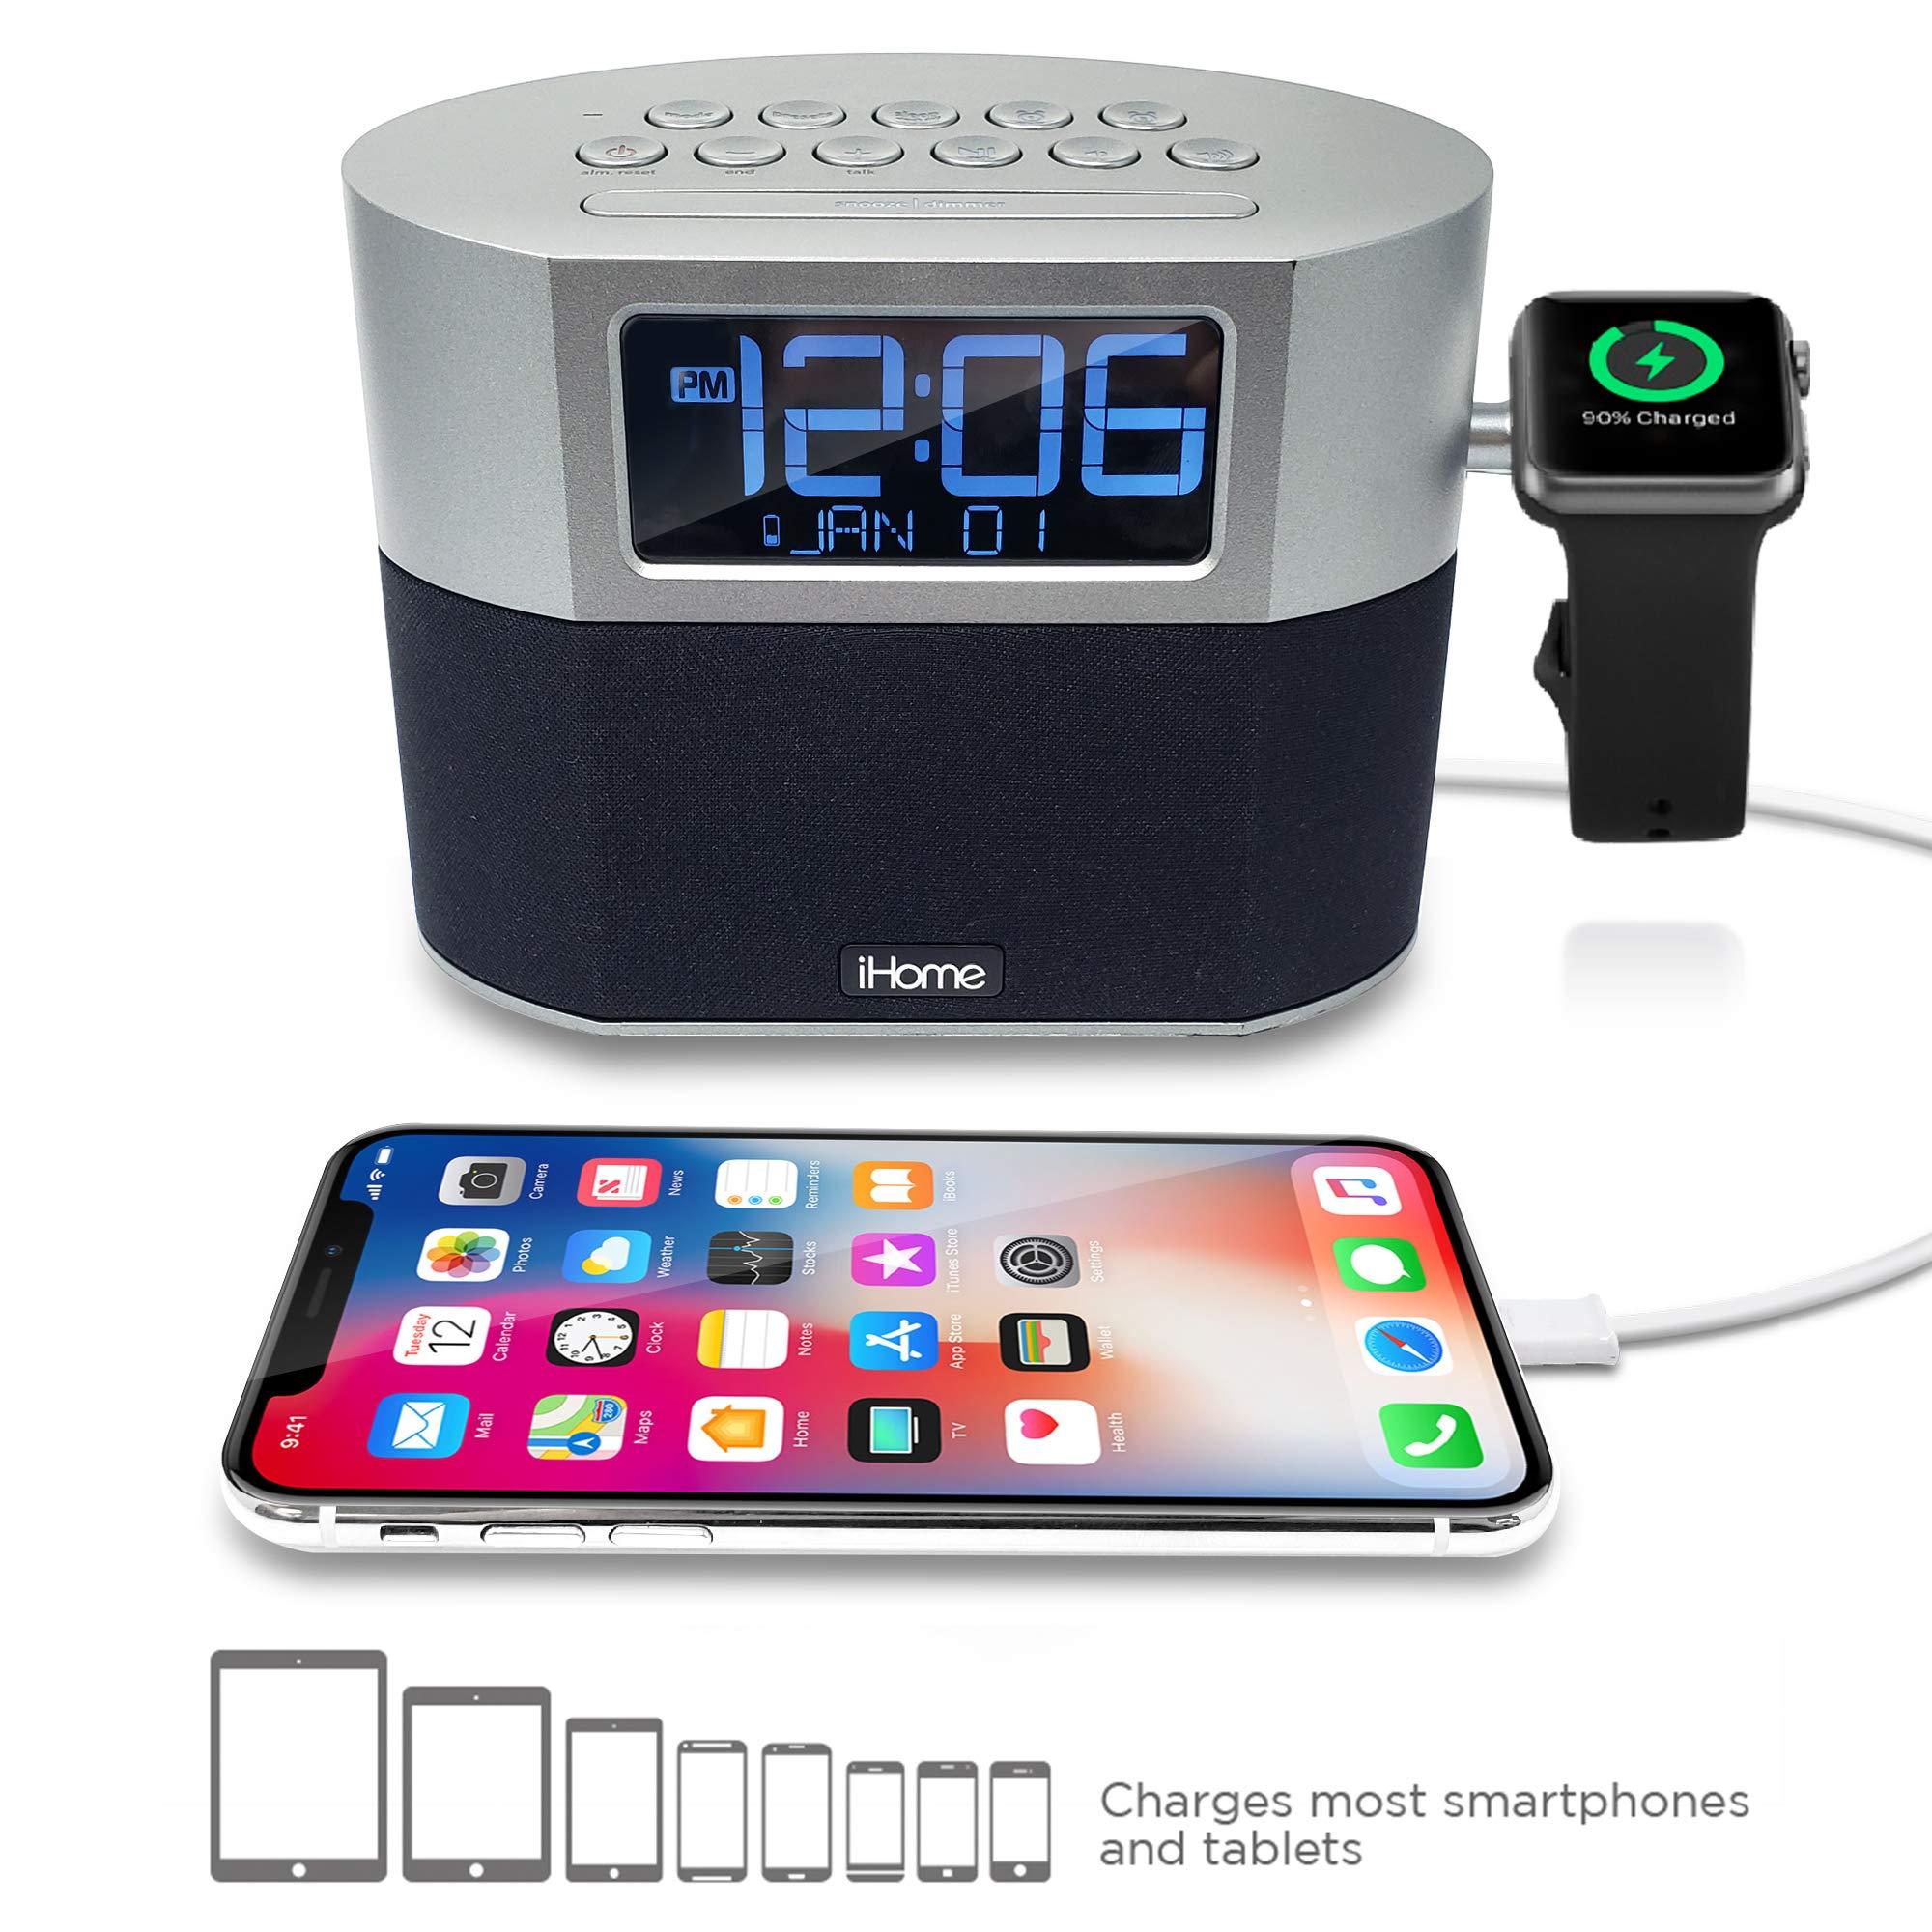 iHome Bluetooth Alarm Speakerphone Charging